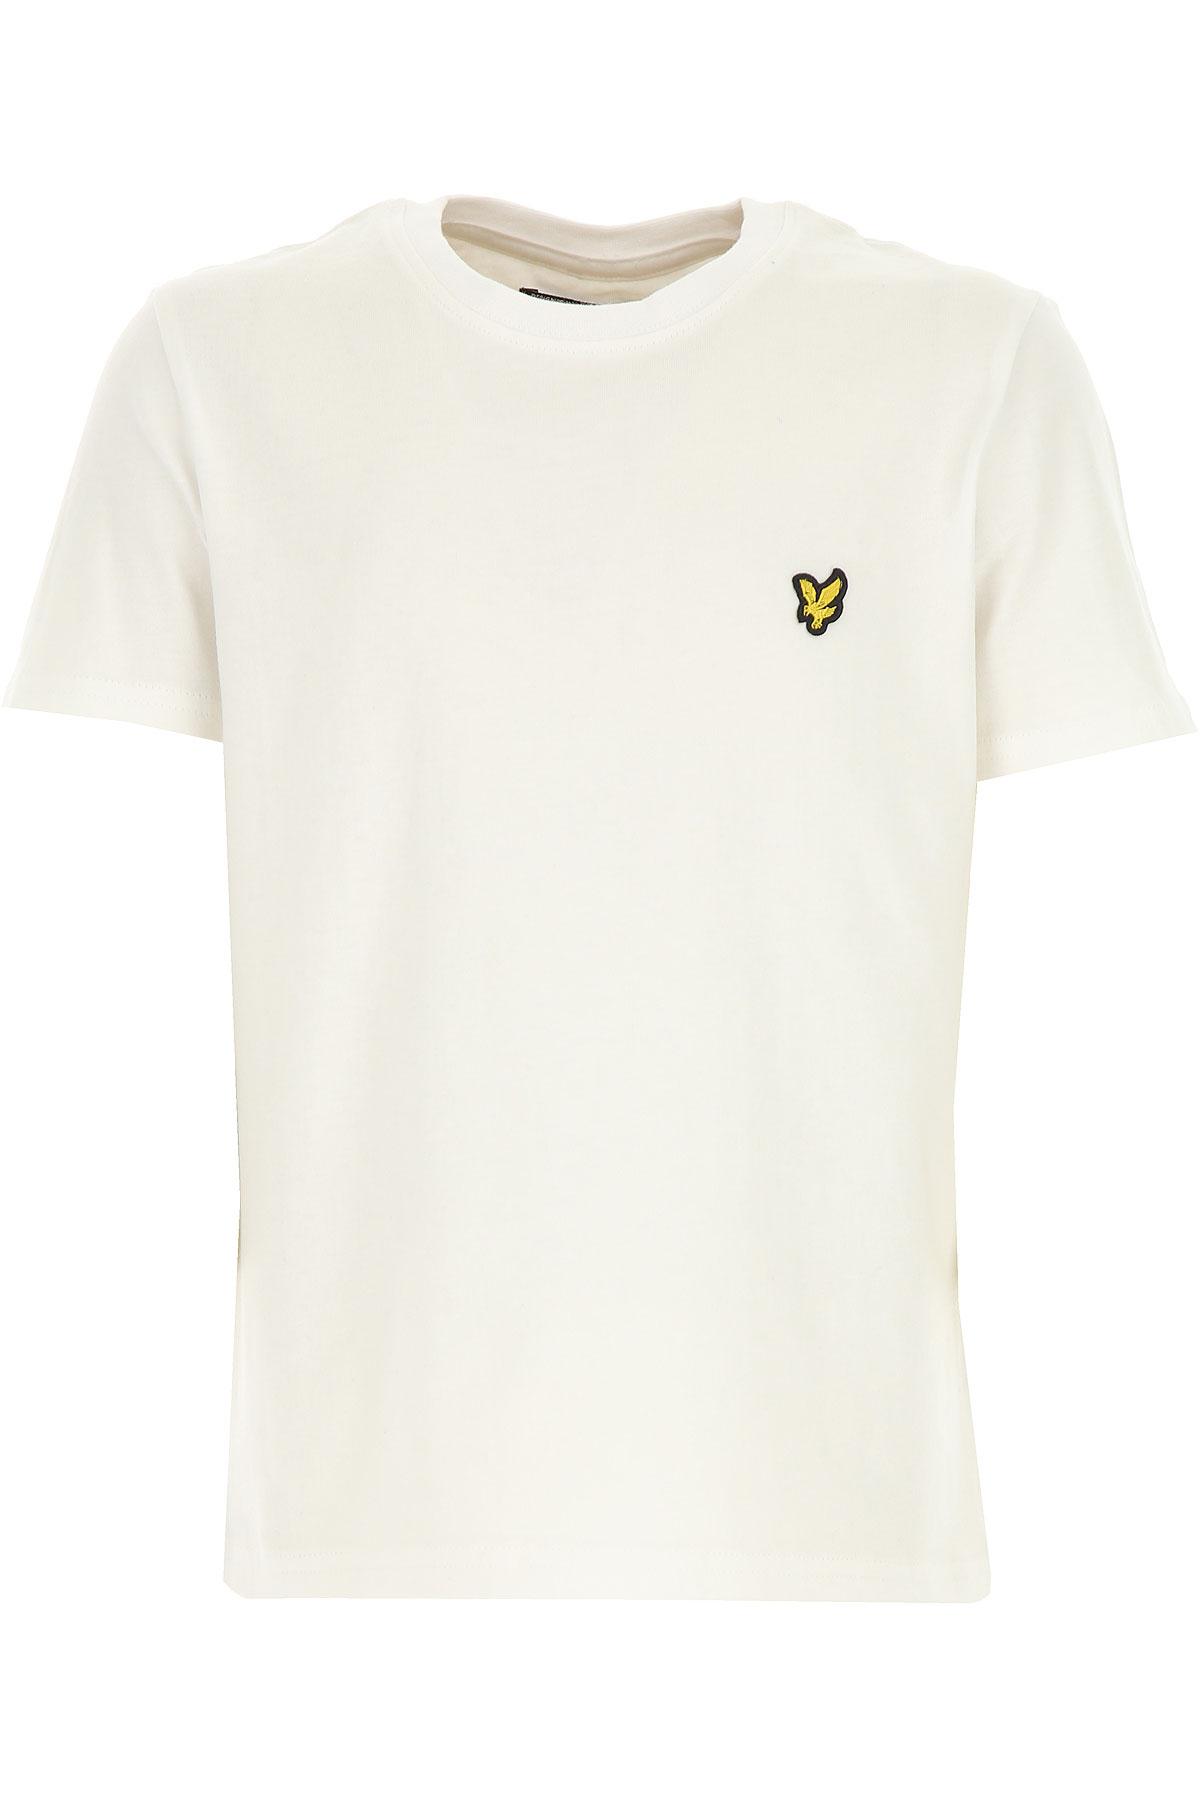 Image of Lyle & Scott Kids T-Shirt for Boys, White, Cotton, 2017, 10Y 8Y